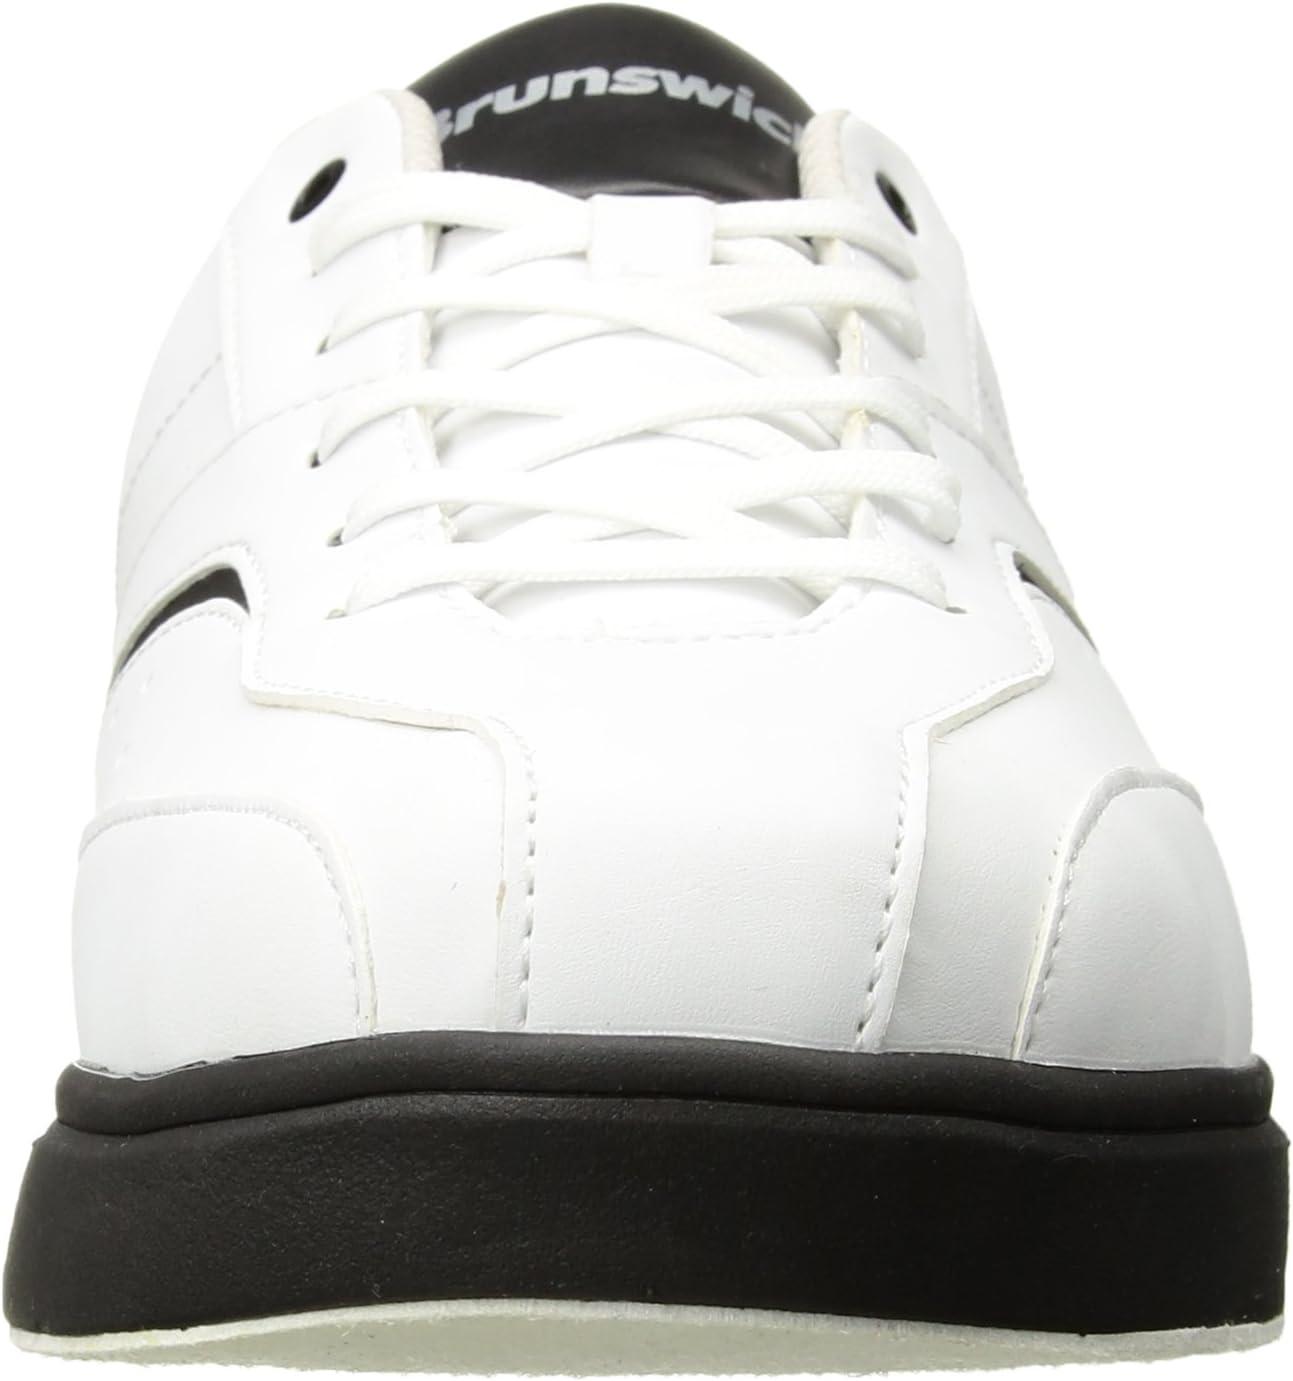 Brunswick Vapor Mens Bowling Shoe White//Black